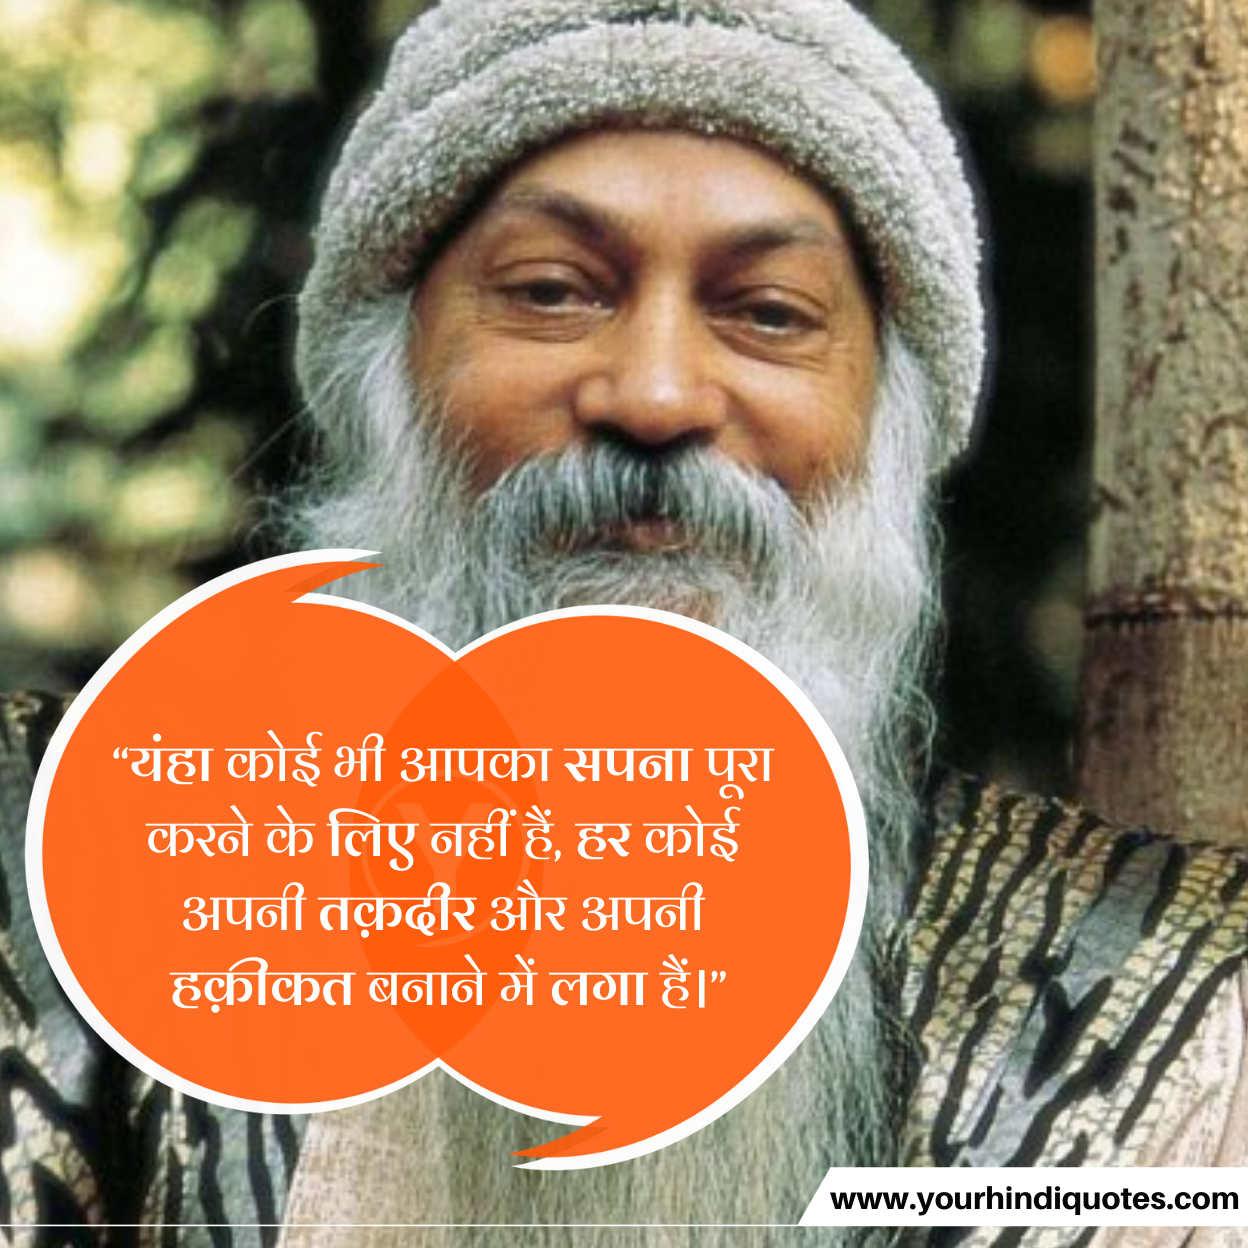 Osho Hindi Quotes Images